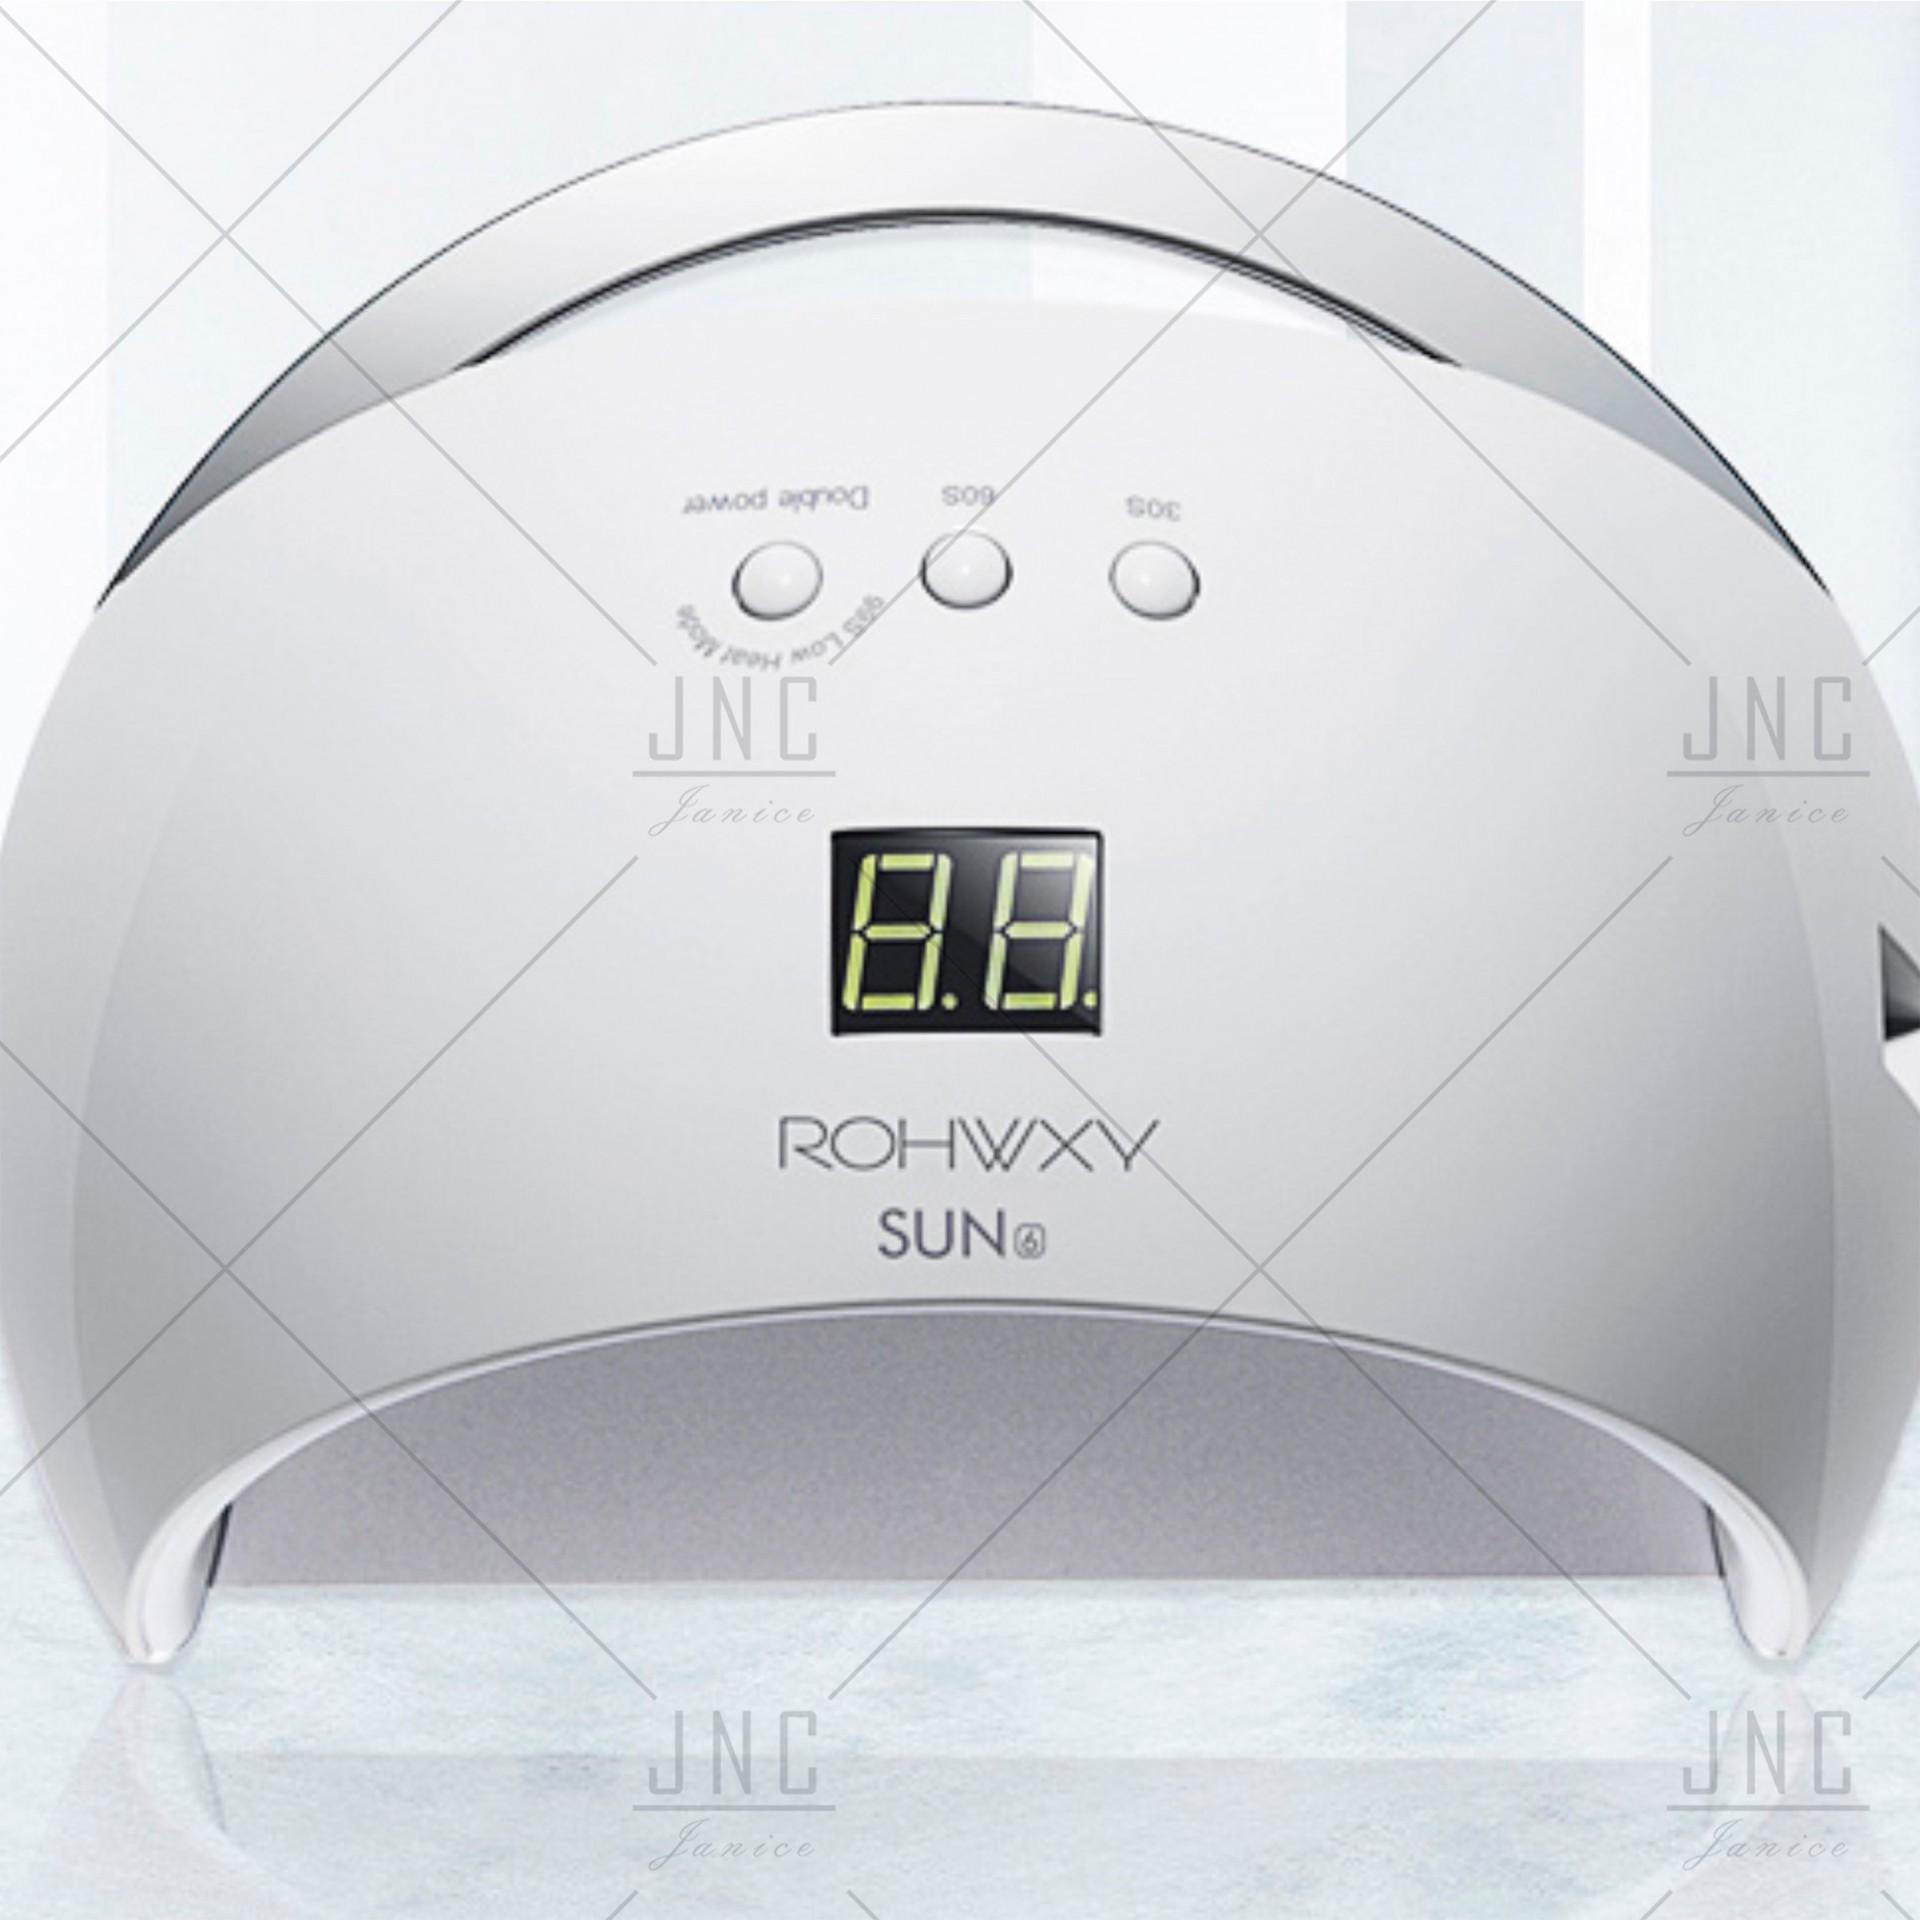 Catalisador LED UV Duplo   48W   Sun 6   Ref.LML011